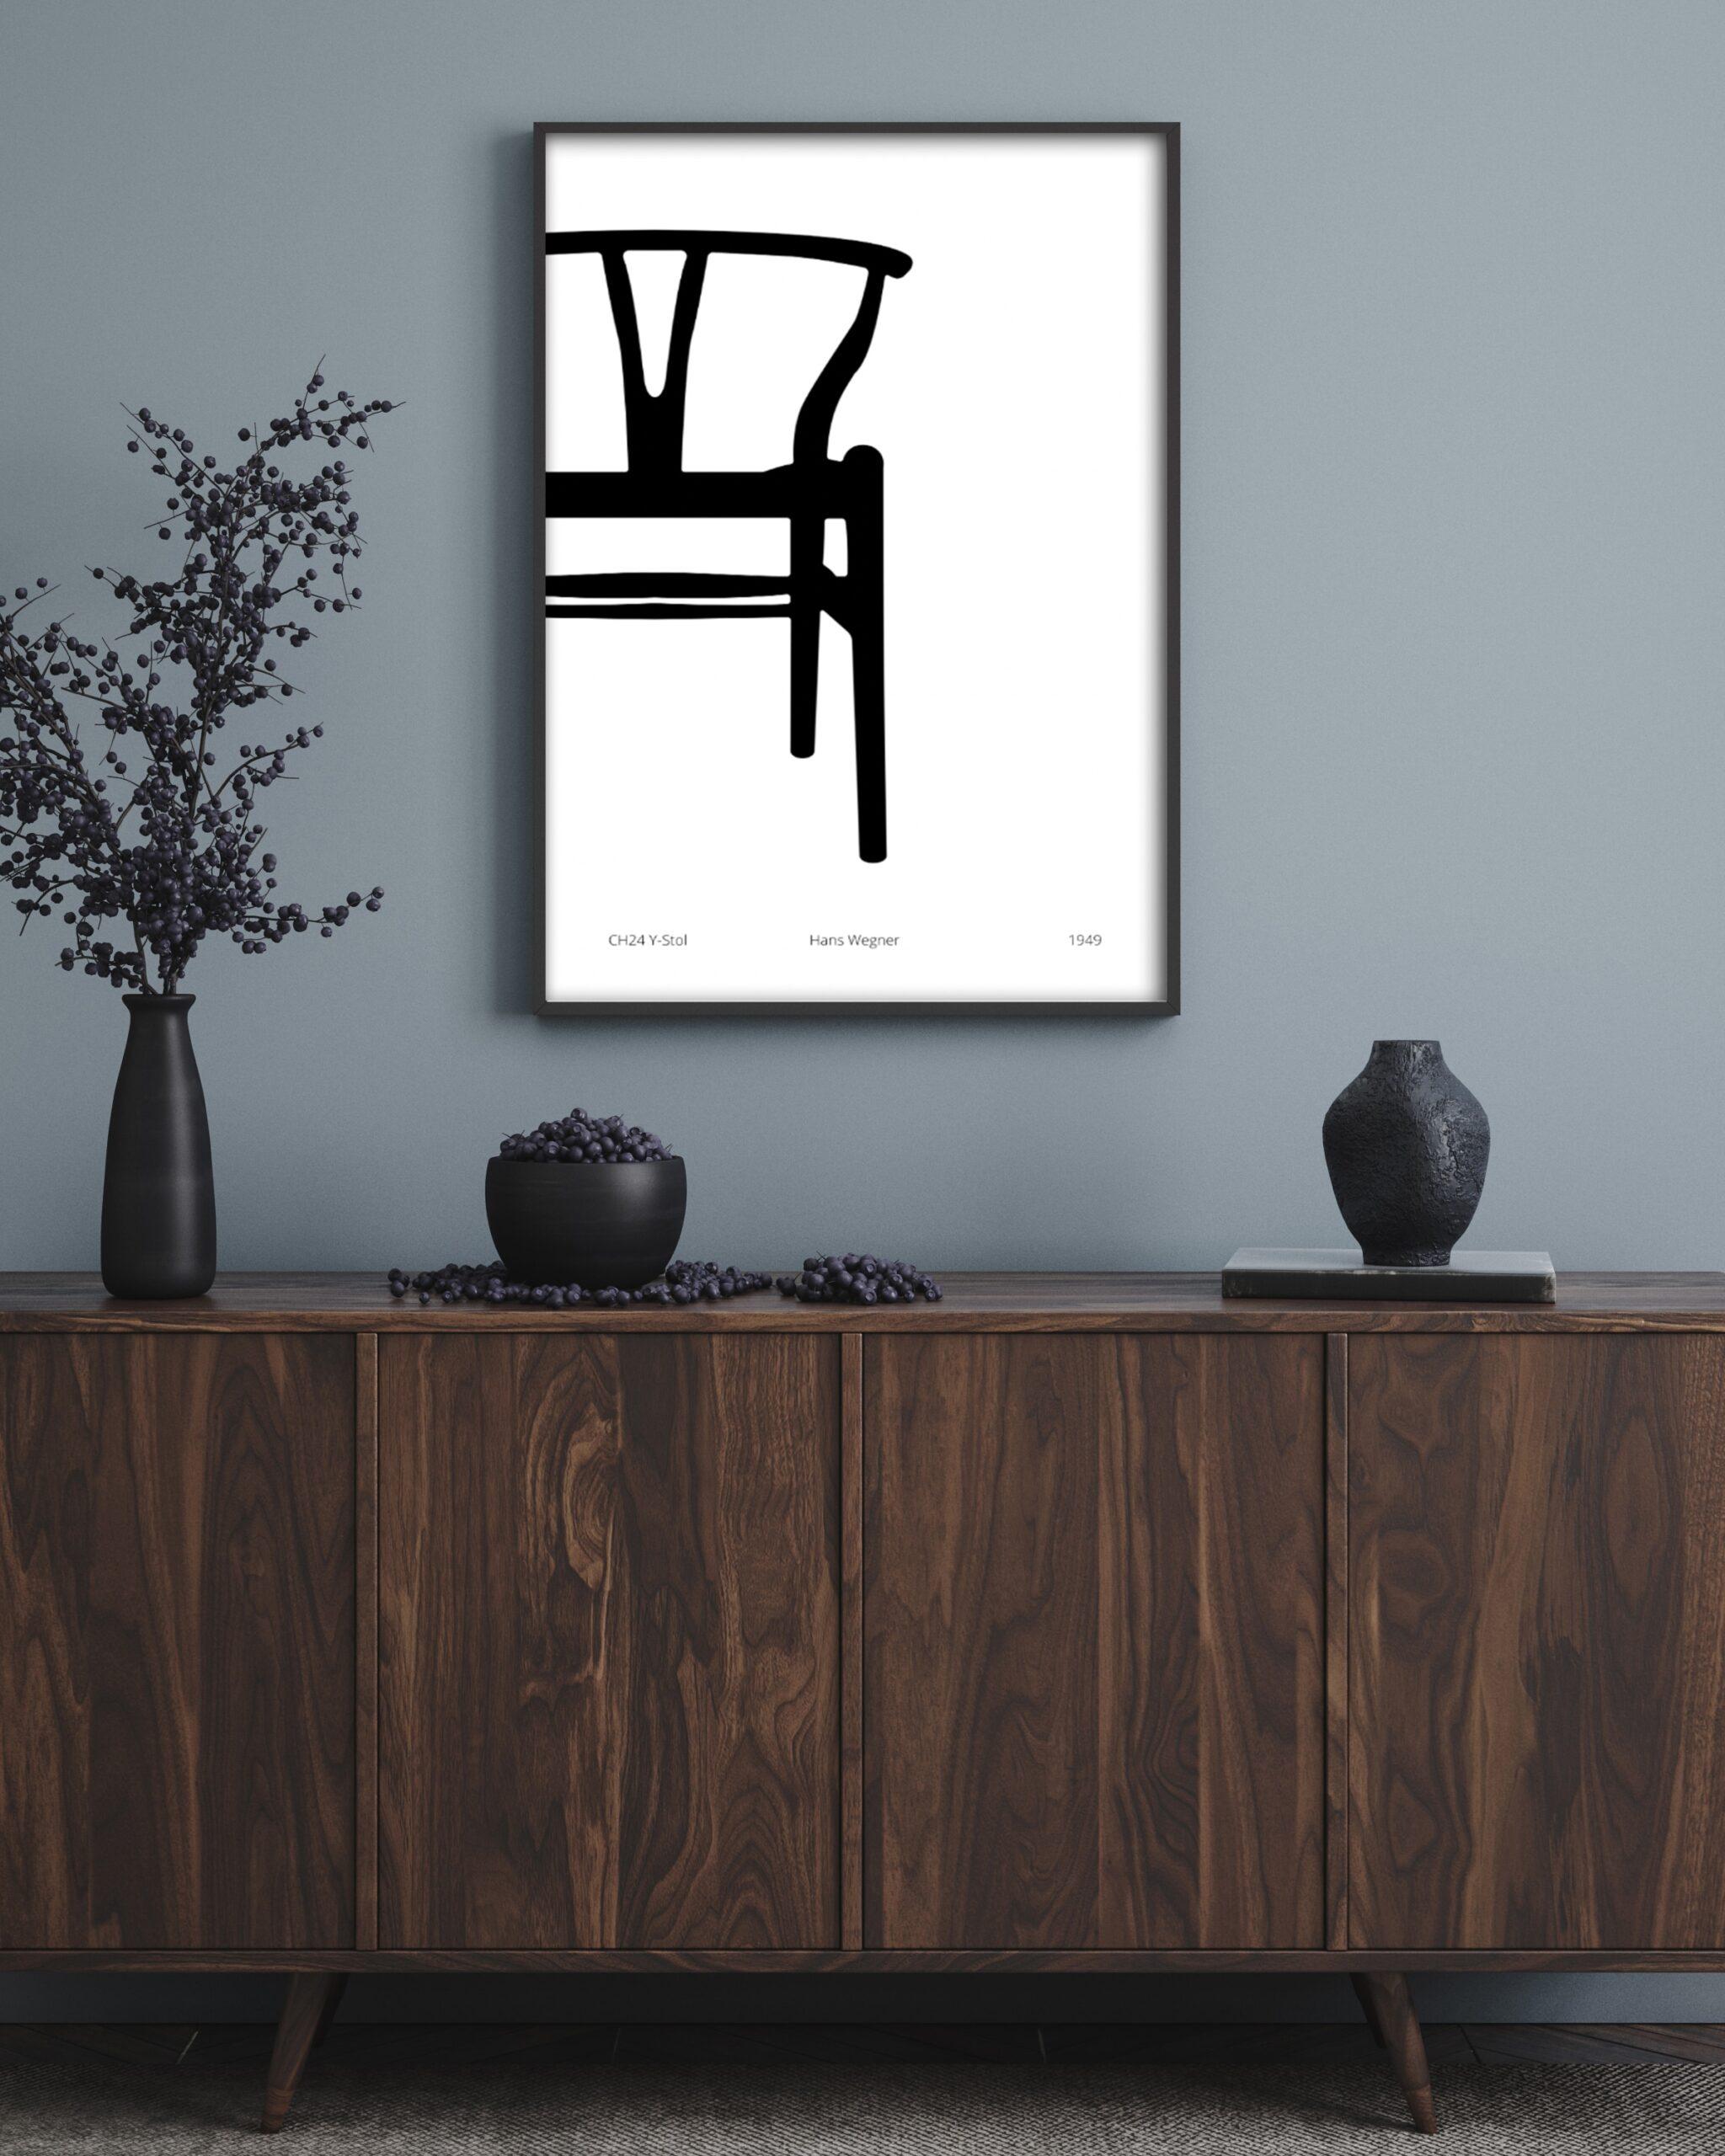 Artsy / artsy black and white posters